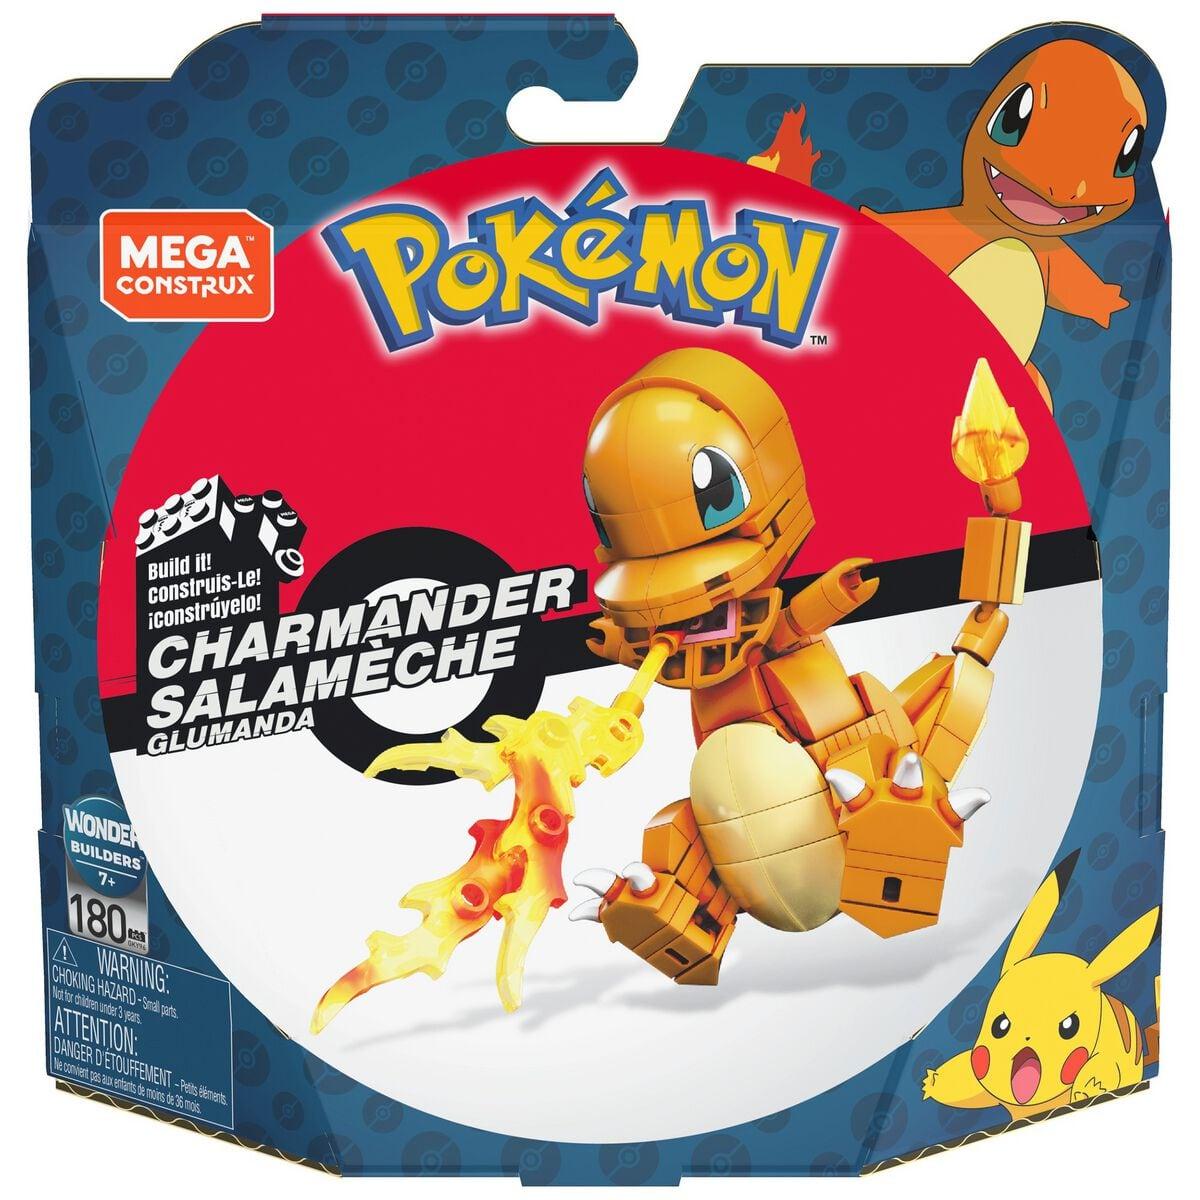 Pokémon Mega Construx GKY96 Pokémon Spielfigur